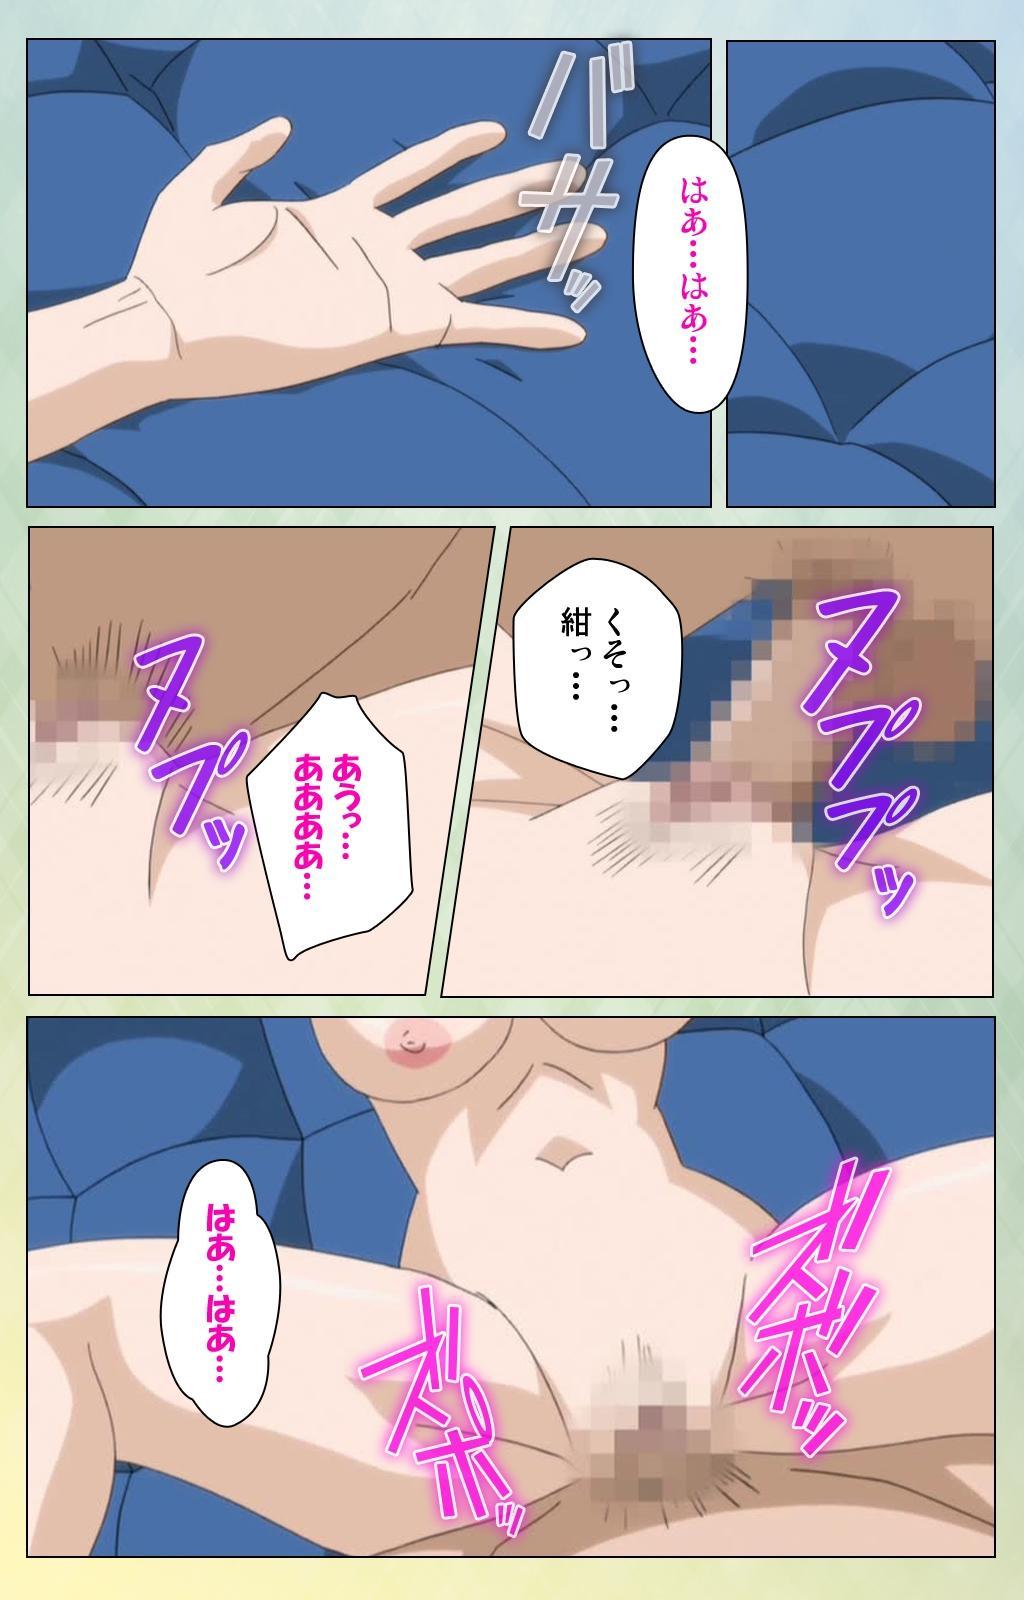 Furueru Kuchibiru fuzzy lips0 Complete Ban 73